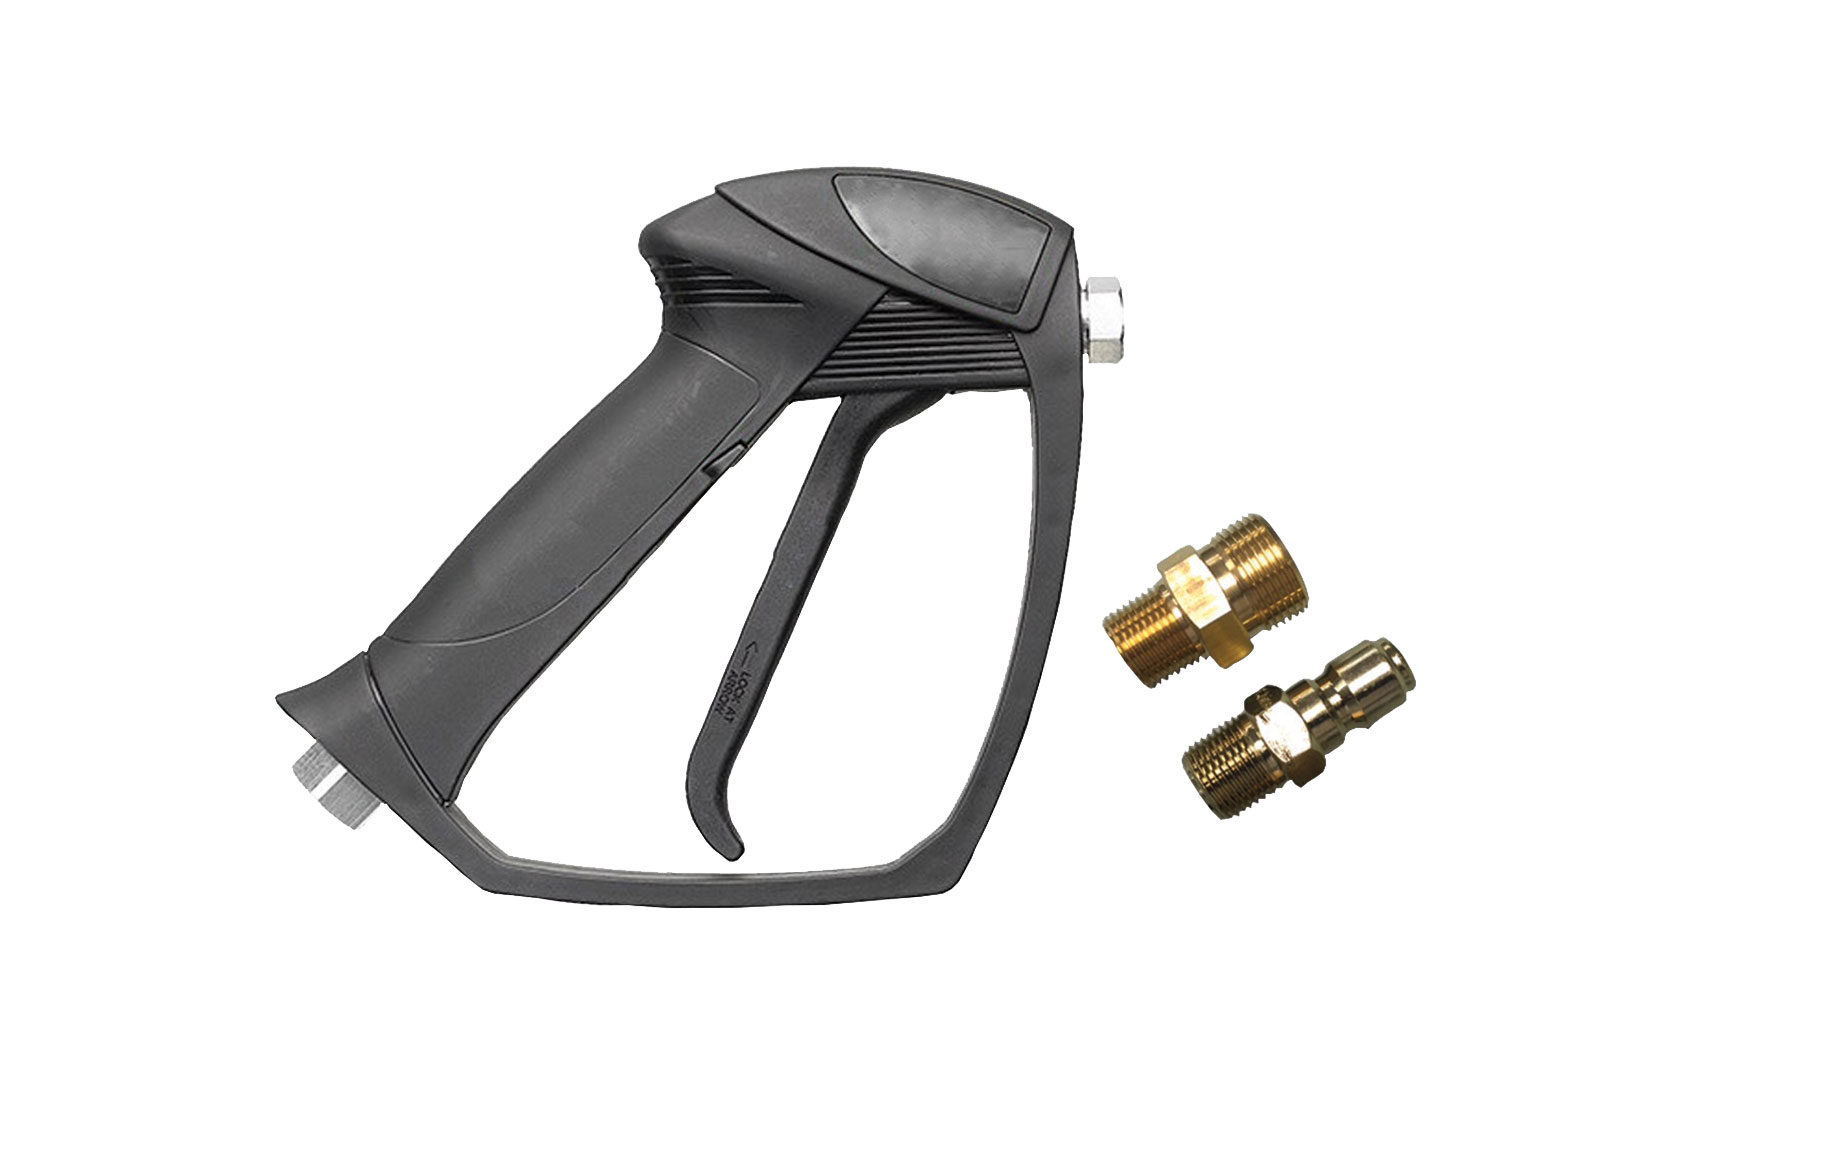 Image of spray gun handle and 2 metal fittings